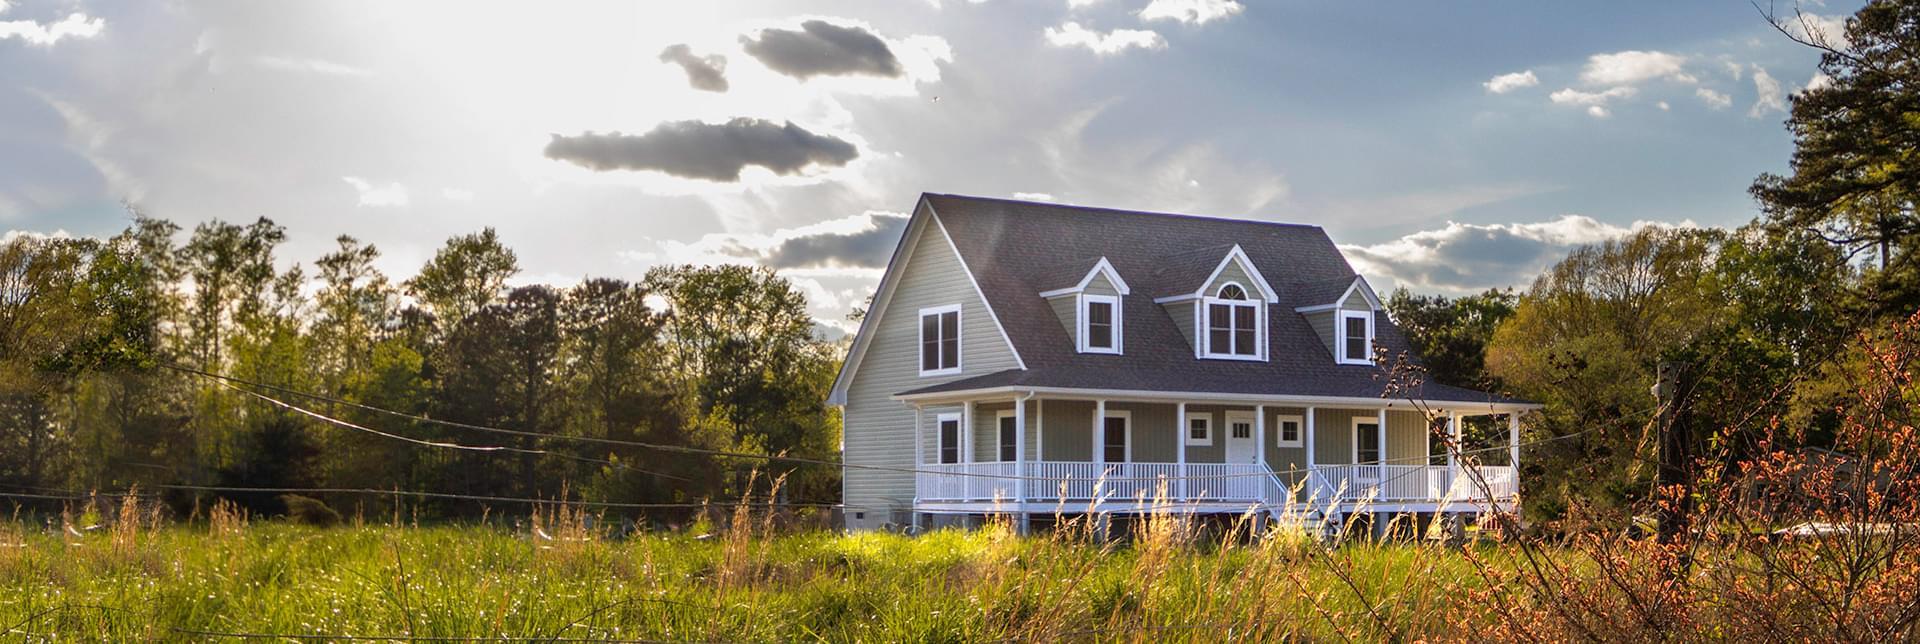 New Homes in Nottoway County VA